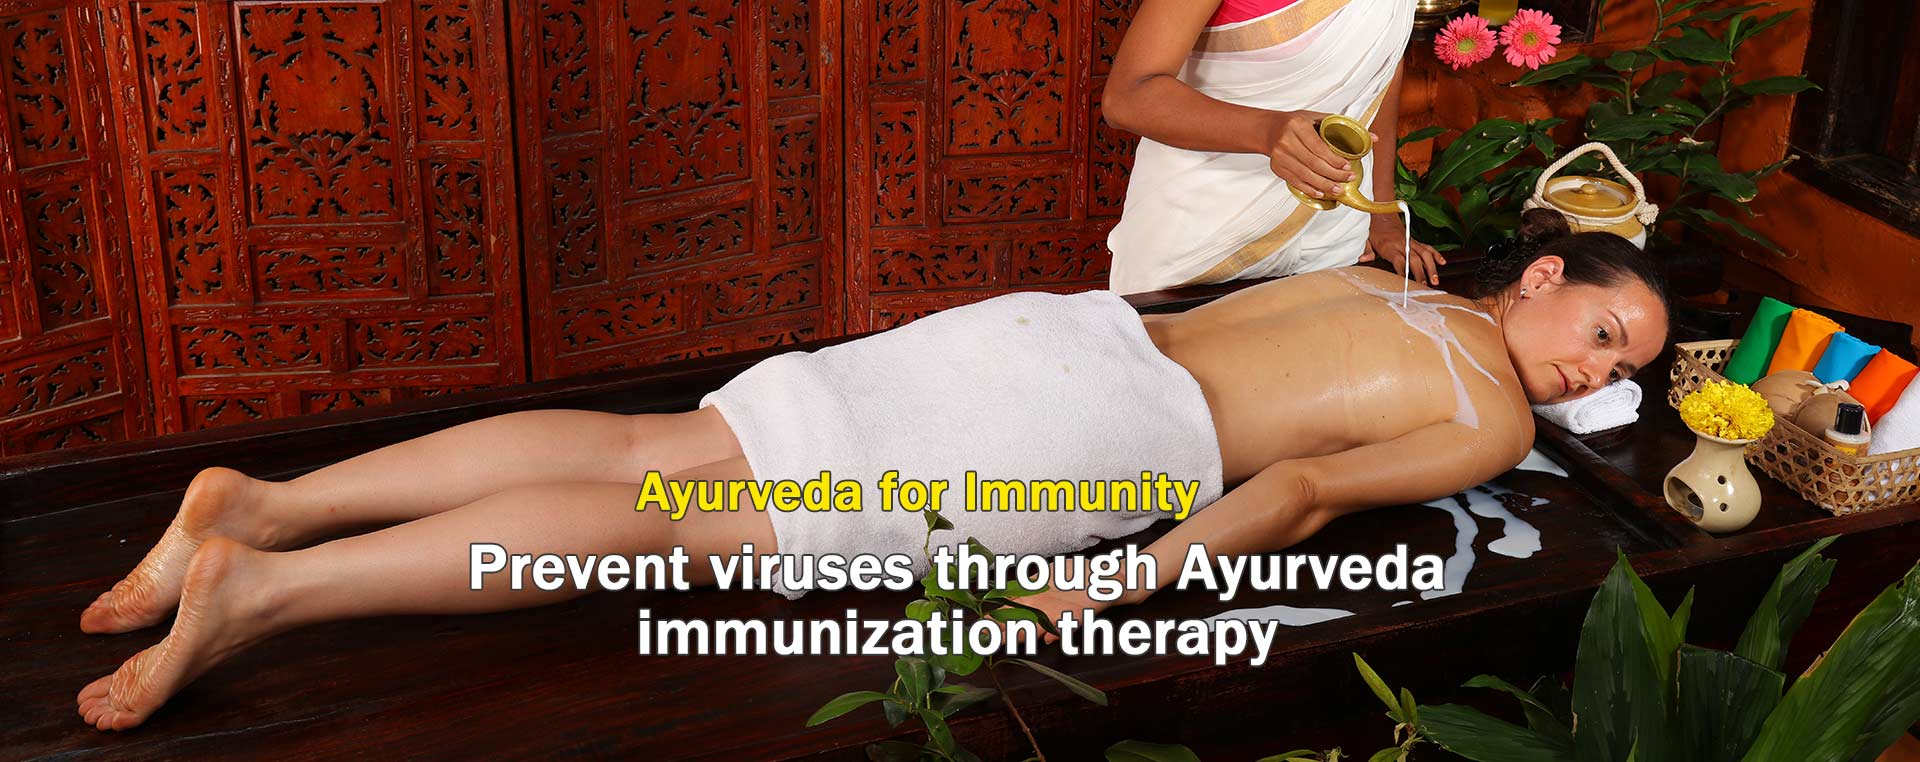 Prevent viruses through Ayurveda  immunization therapy